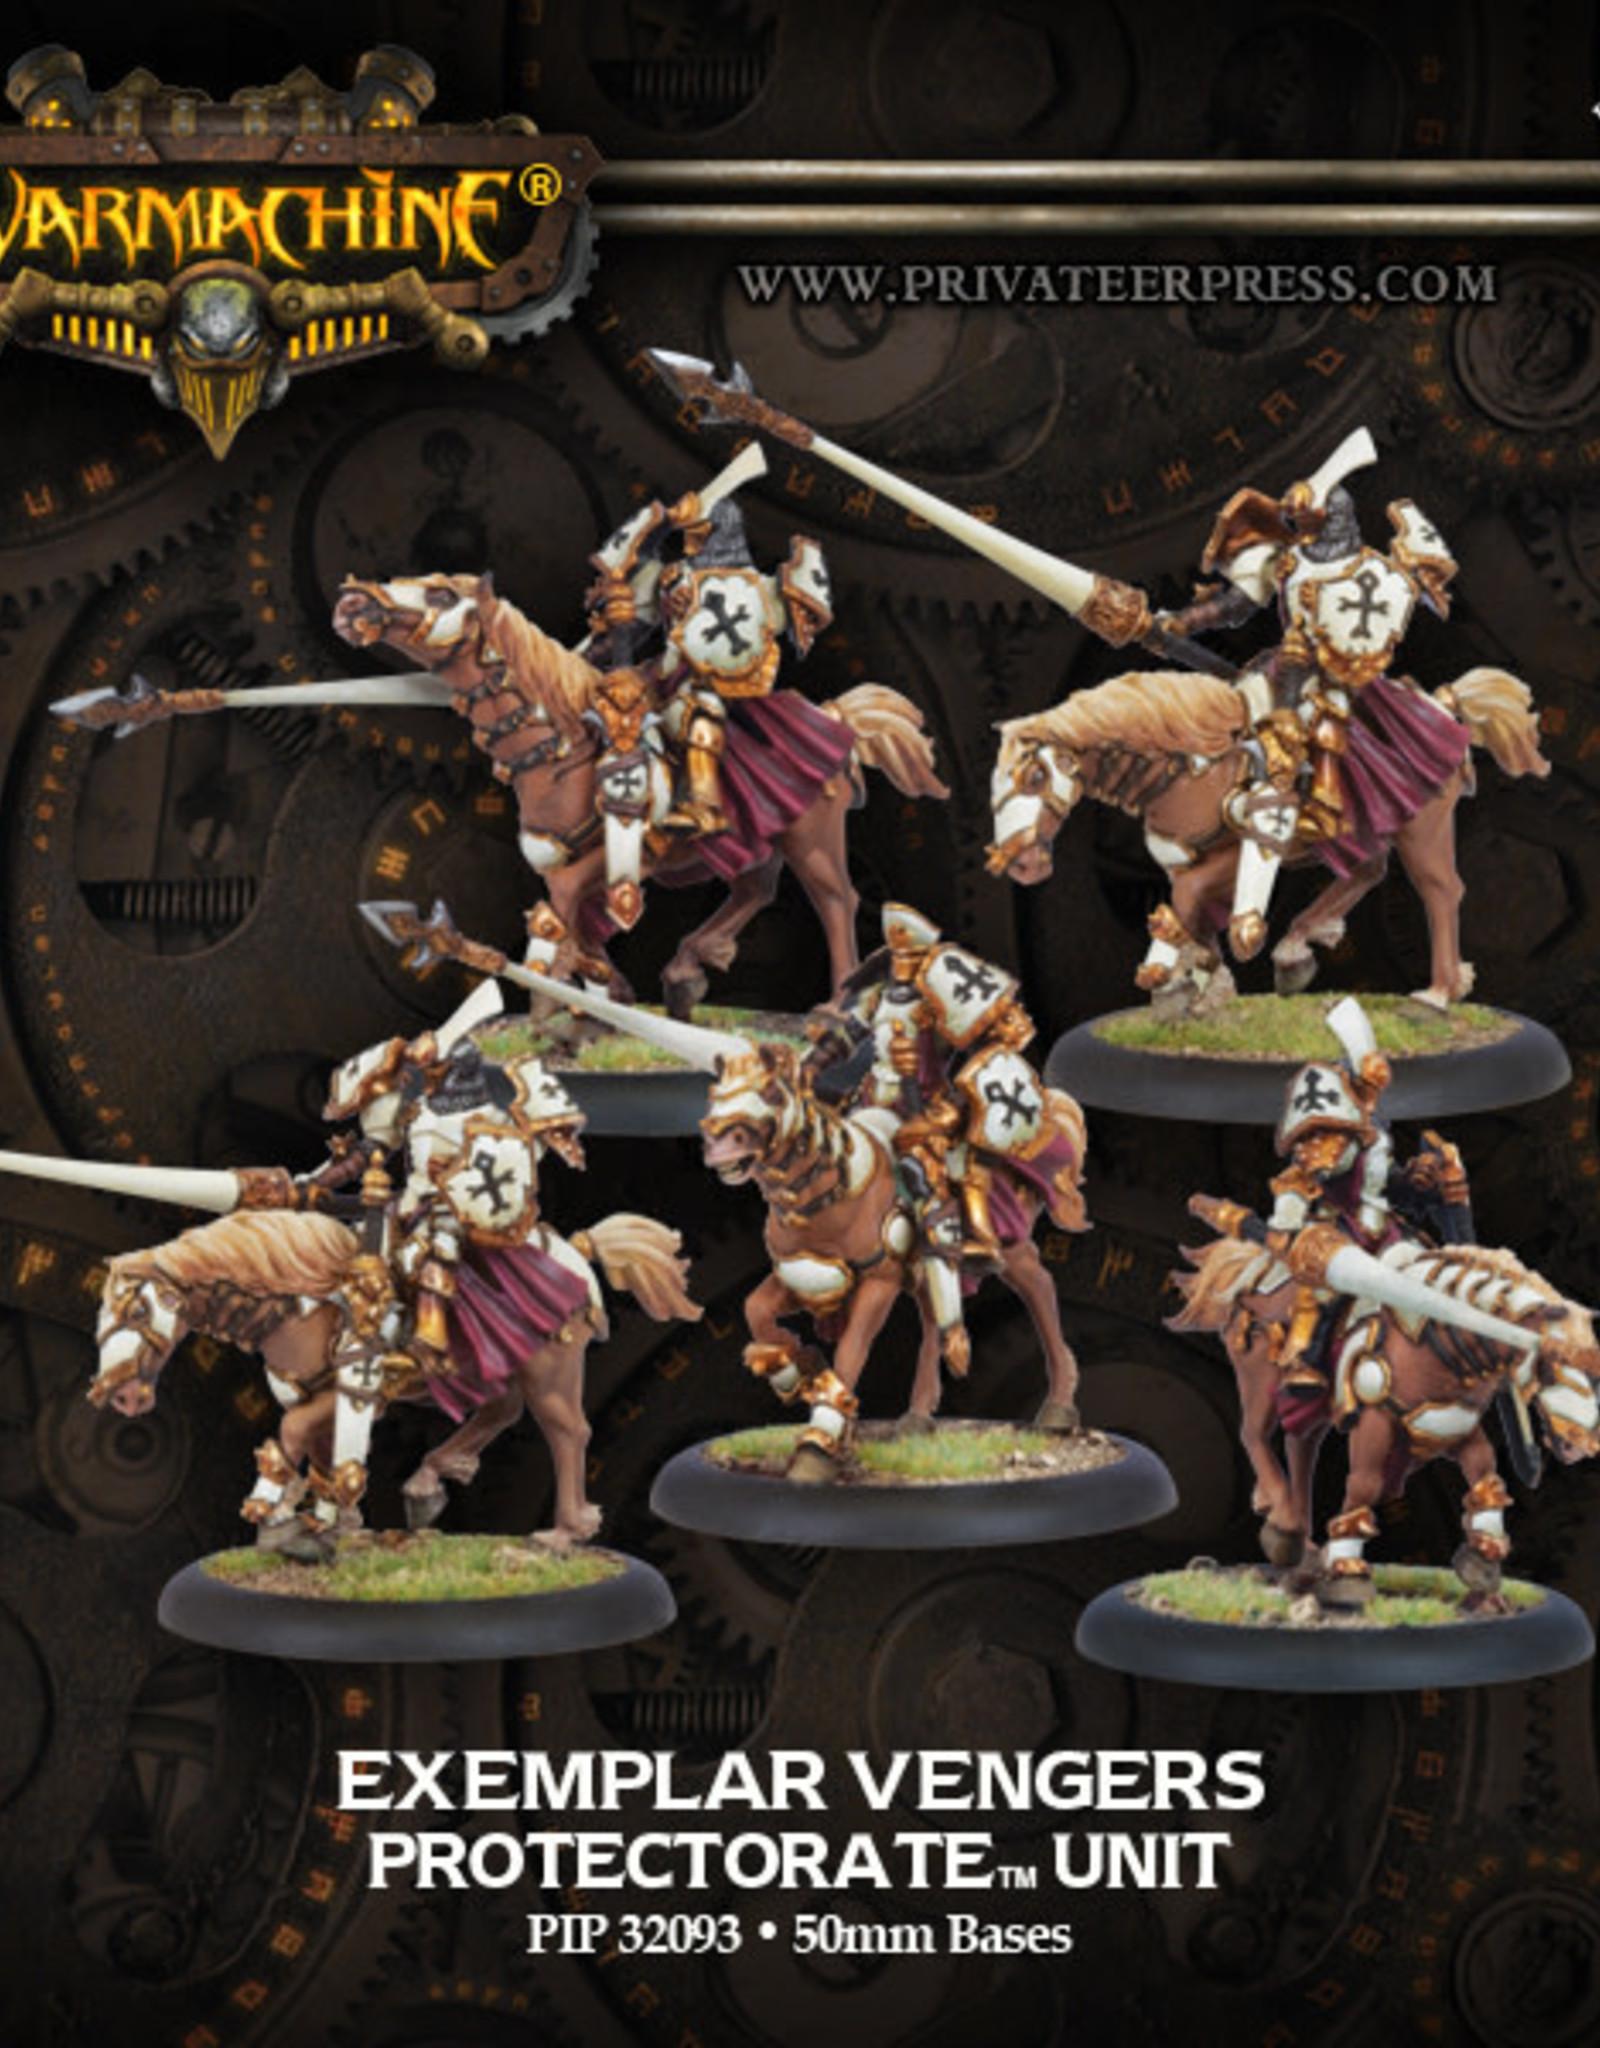 Warmachine Protectorate - Exemplar Vengers